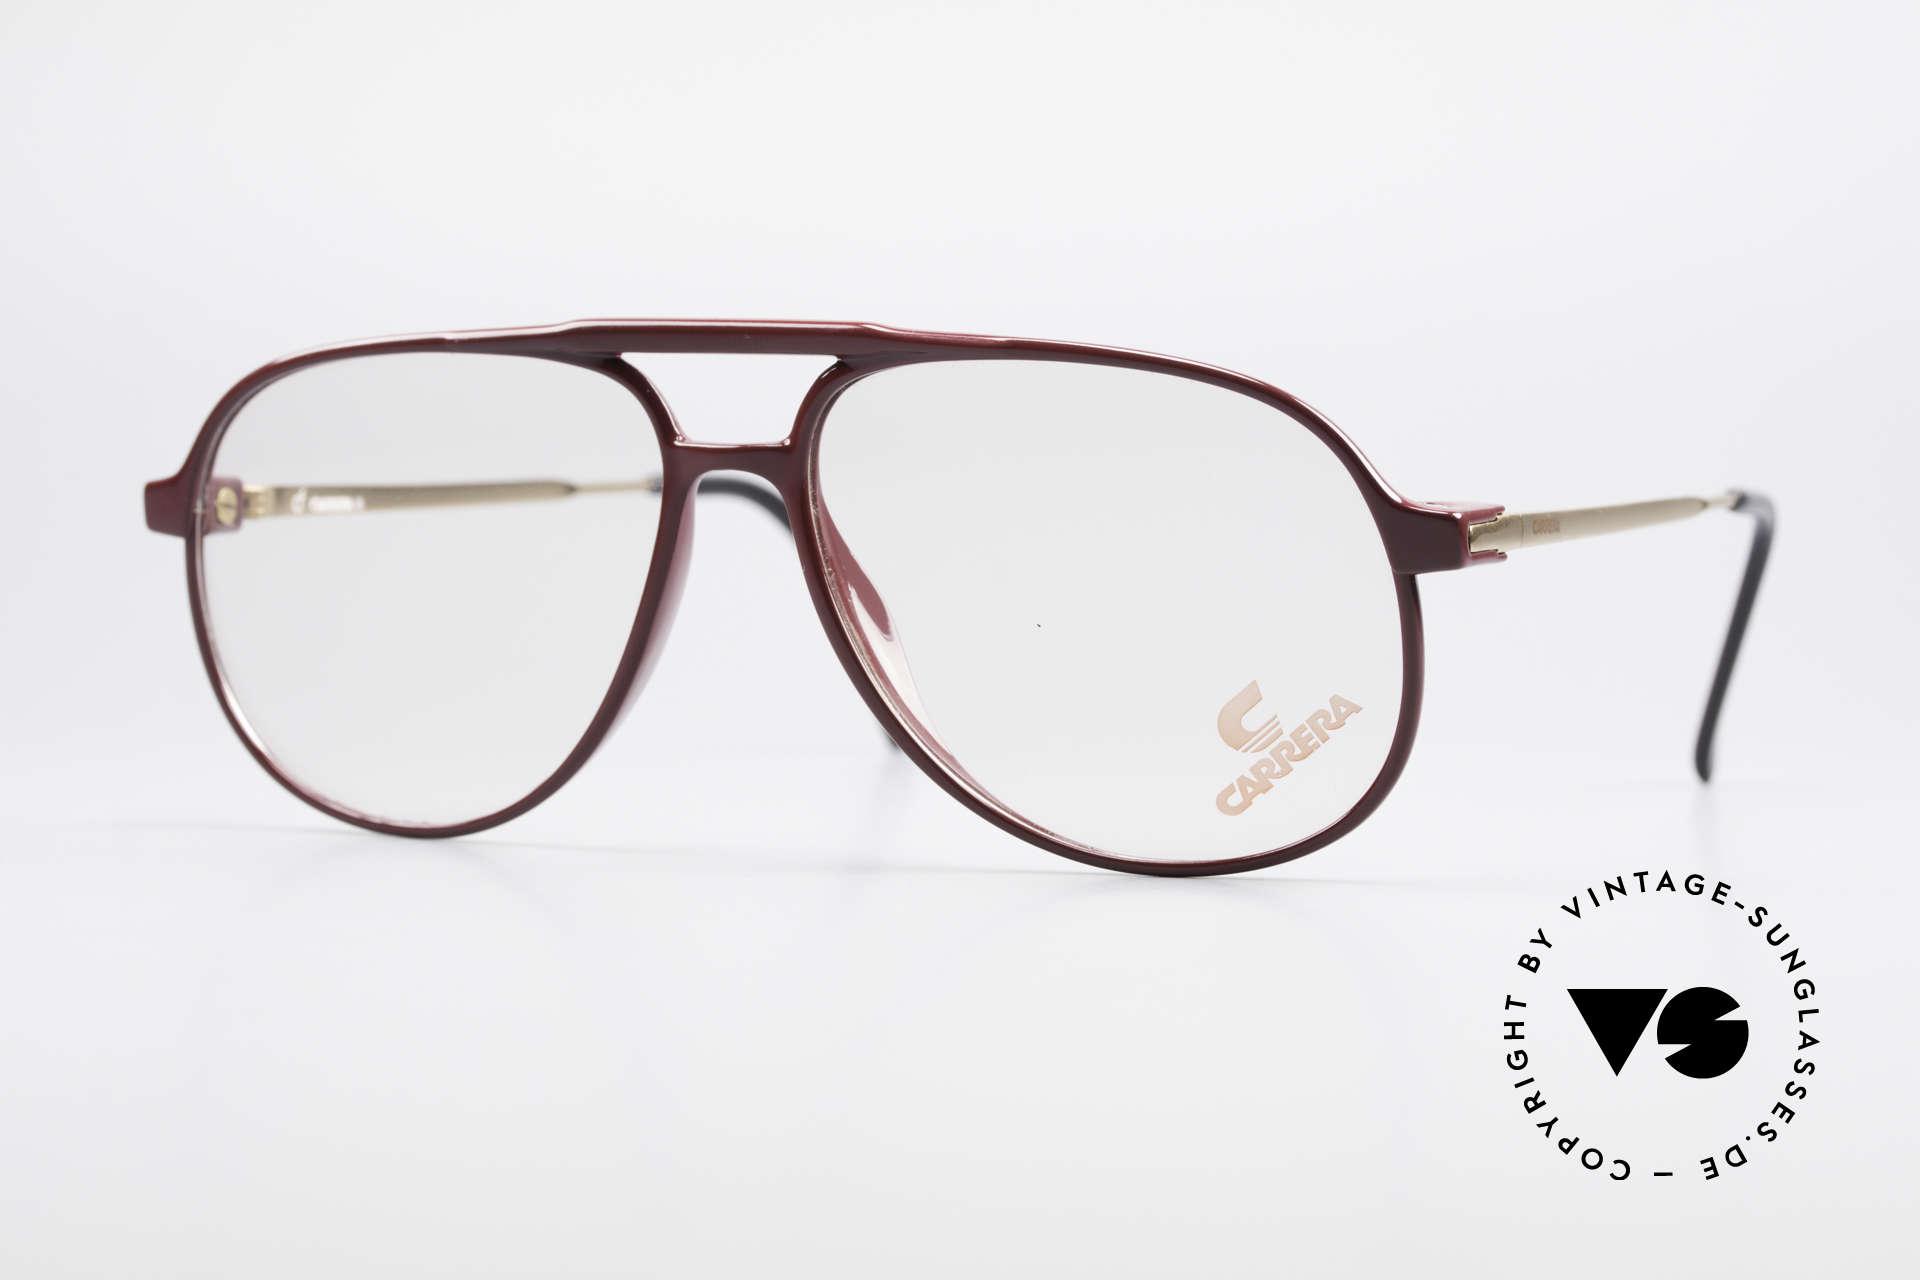 Carrera 5355 Carbon Fibre Aviator Glasses, Carrera 5355 Carbon Fibre vintage 90's eyeglasses, Made for Men